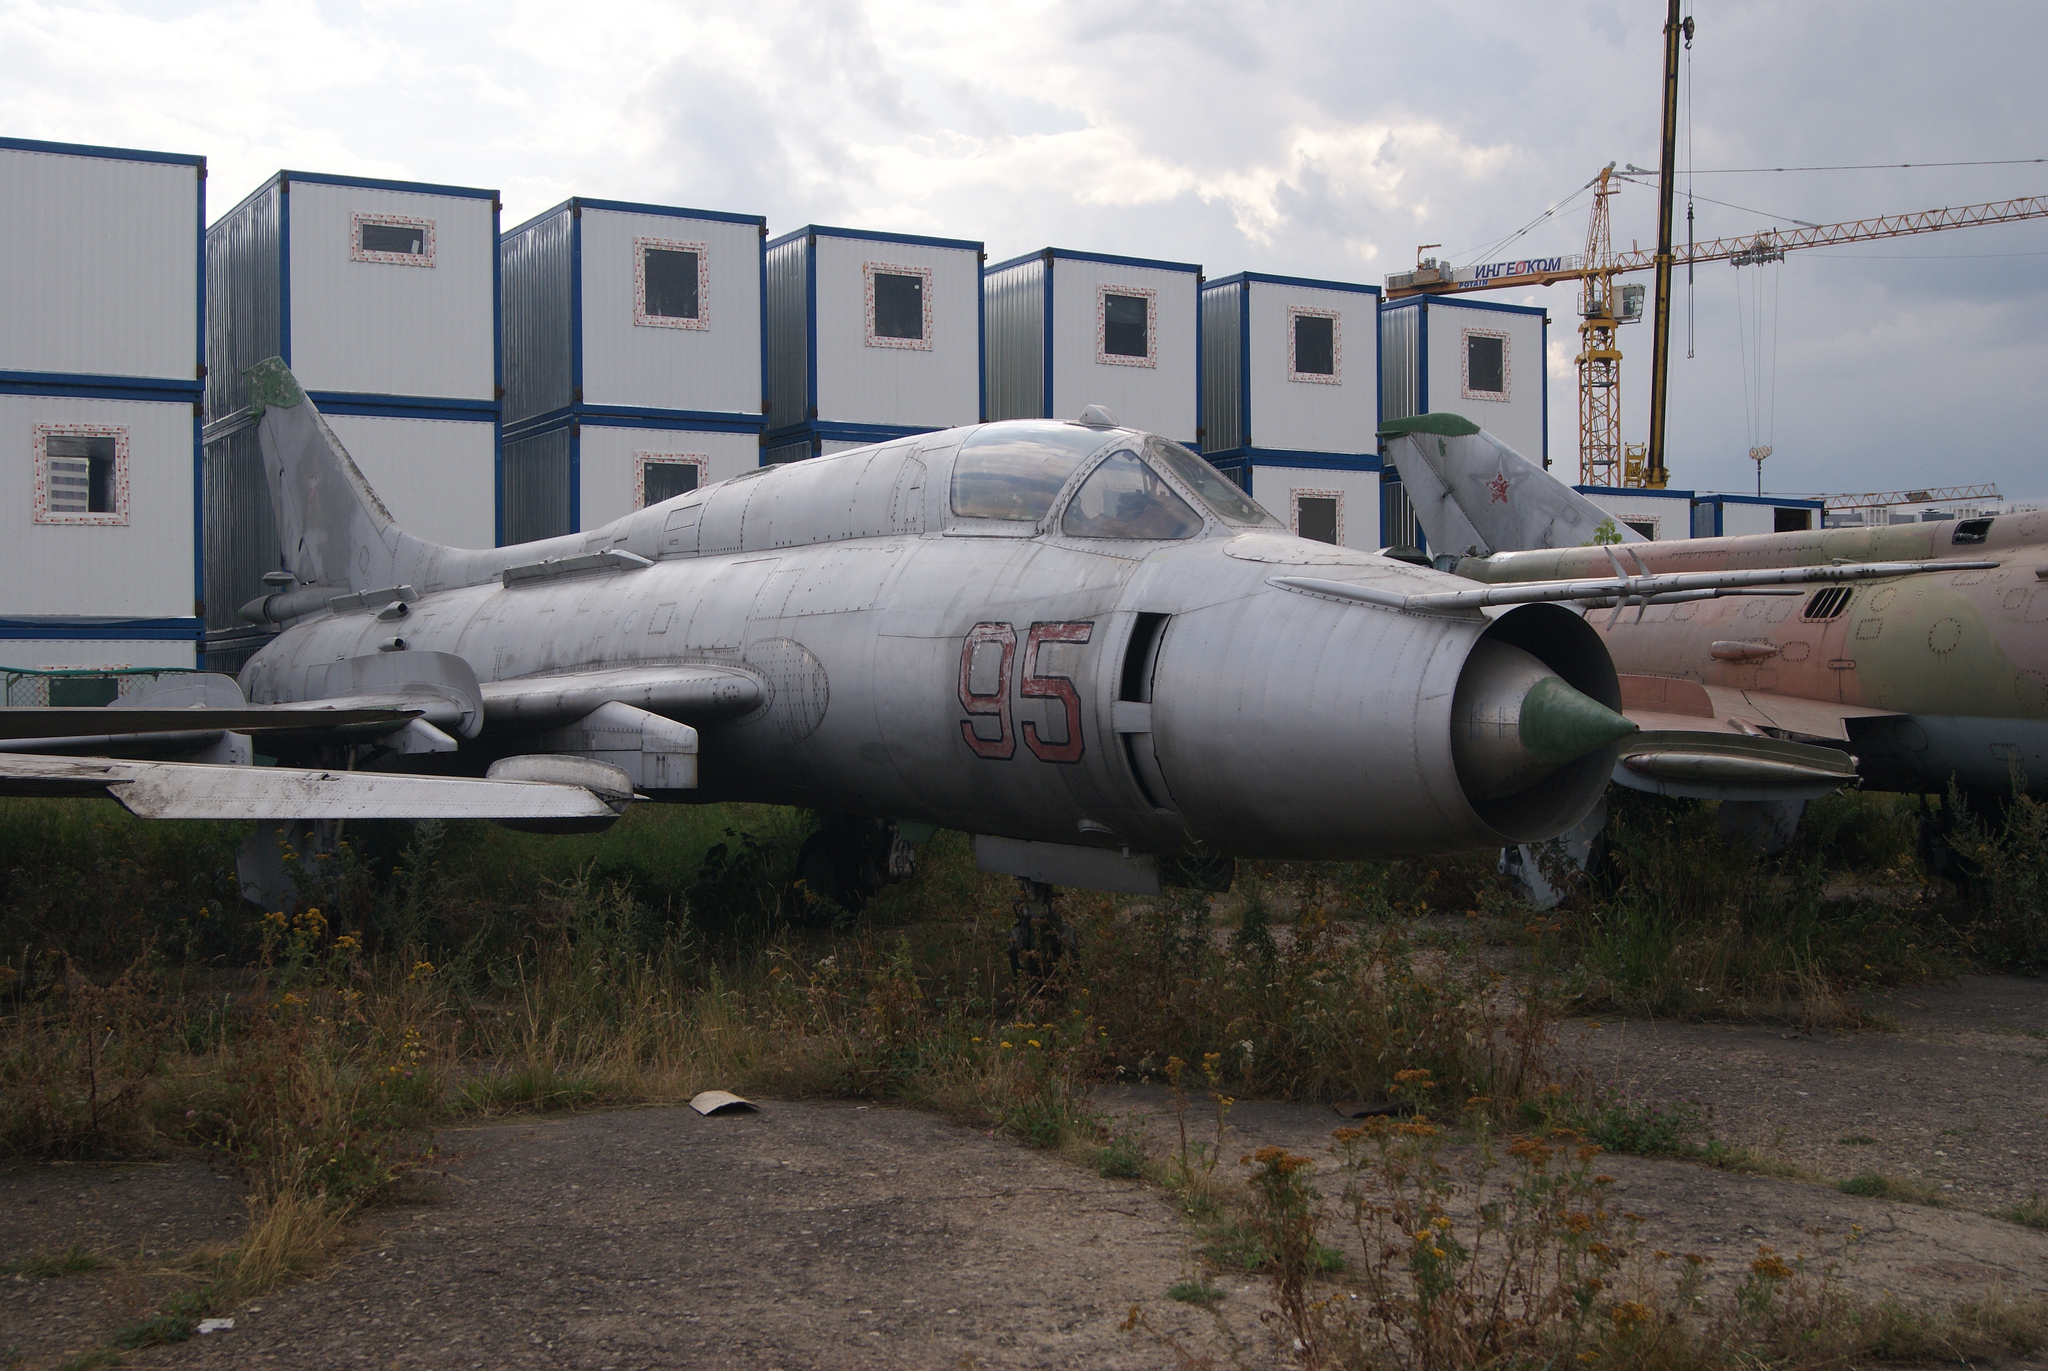 Sukhoi Su-17 (Image Credit: Sergey Rodovnichenko, CC 3.0)